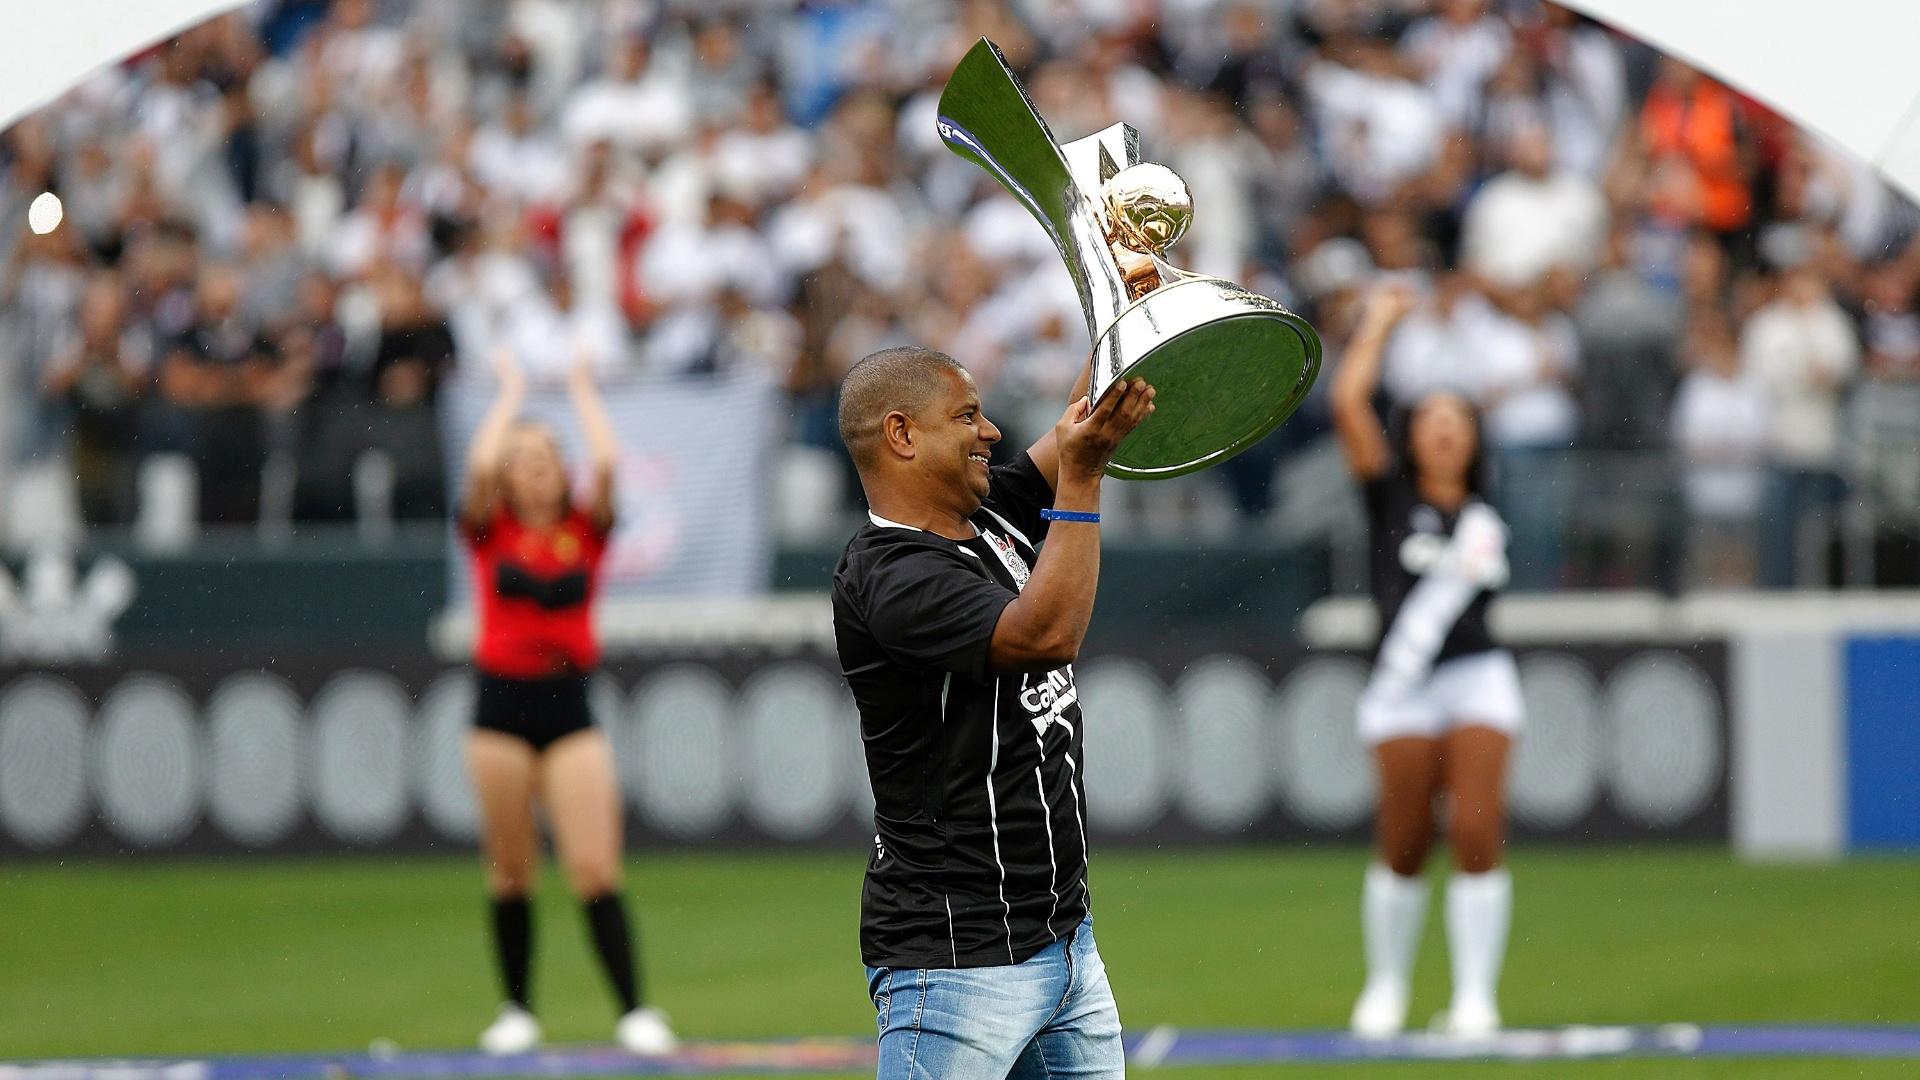 Ídolo do Corinthians, Marcelinho Carioca exibe o troféu do título brasileiro de 2017 antes da partida contra o Fluminense